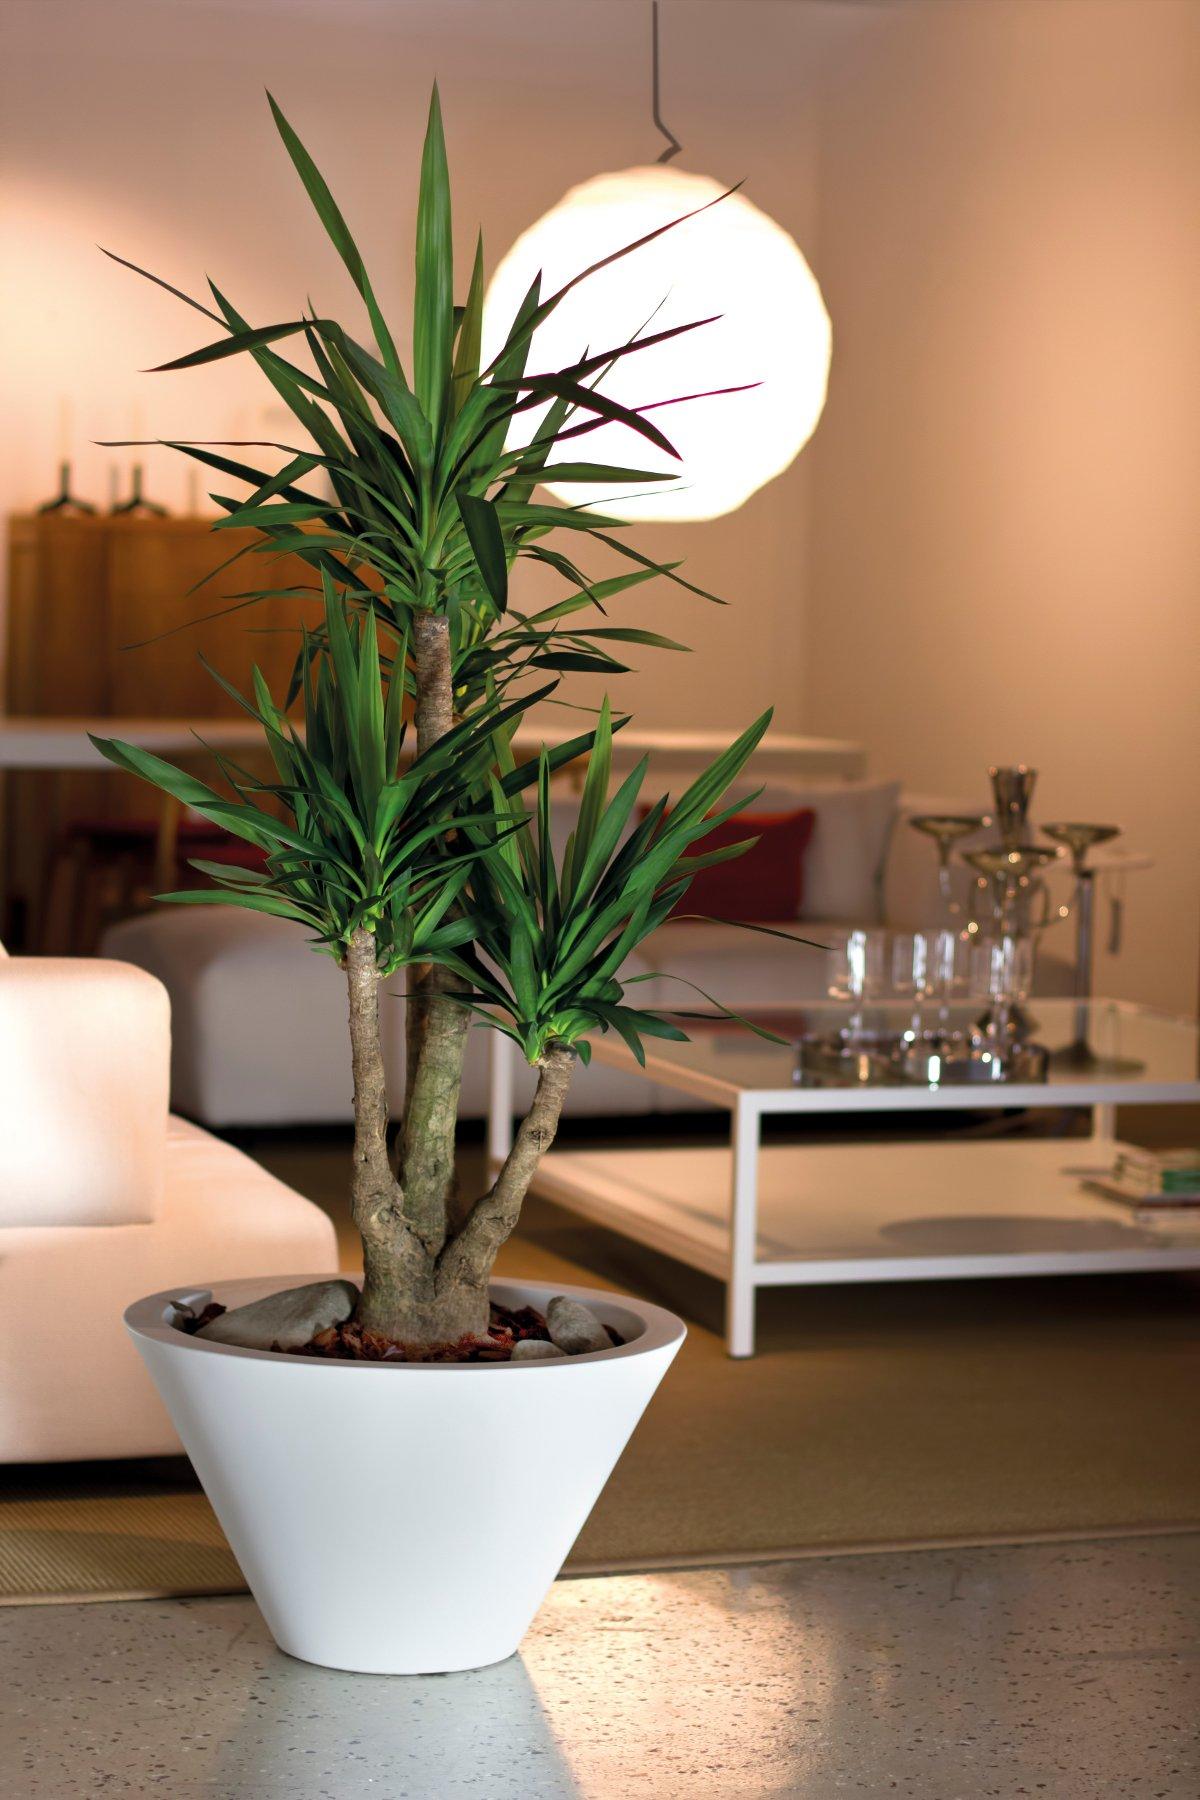 Chiron nicoli - Ikea vasi decorativi ...